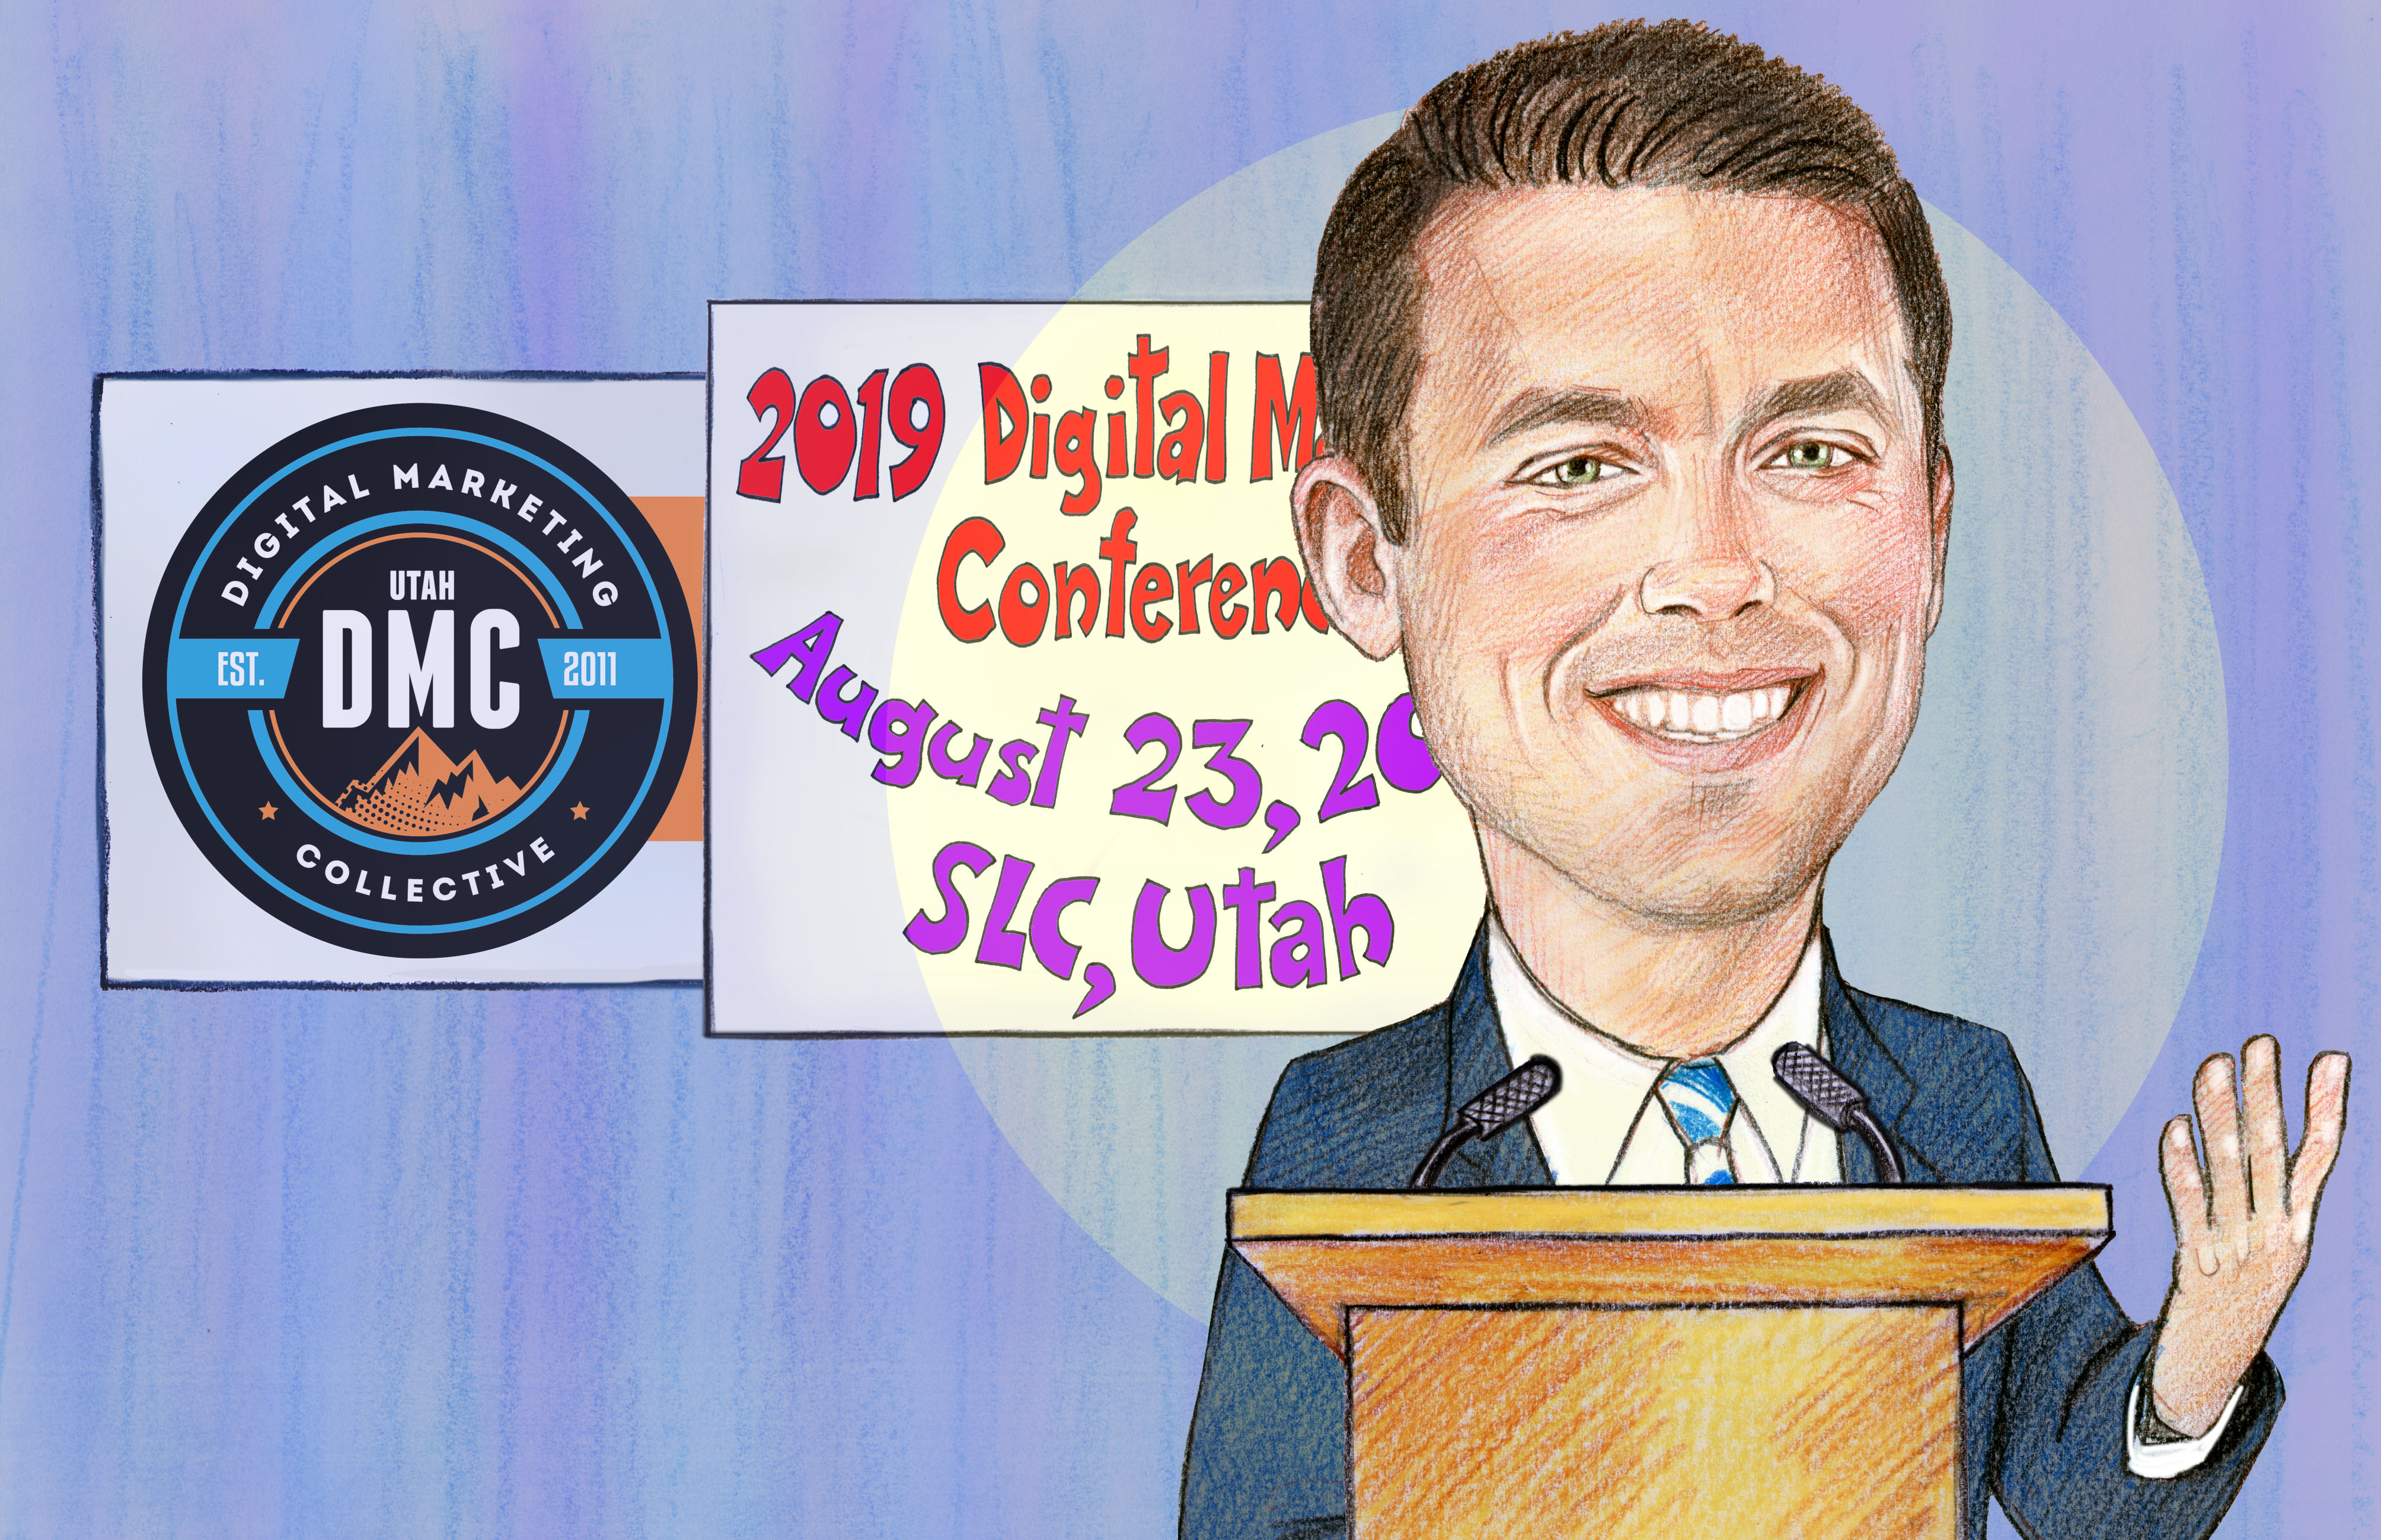 utah-dmc-2019-conference-robert-brady